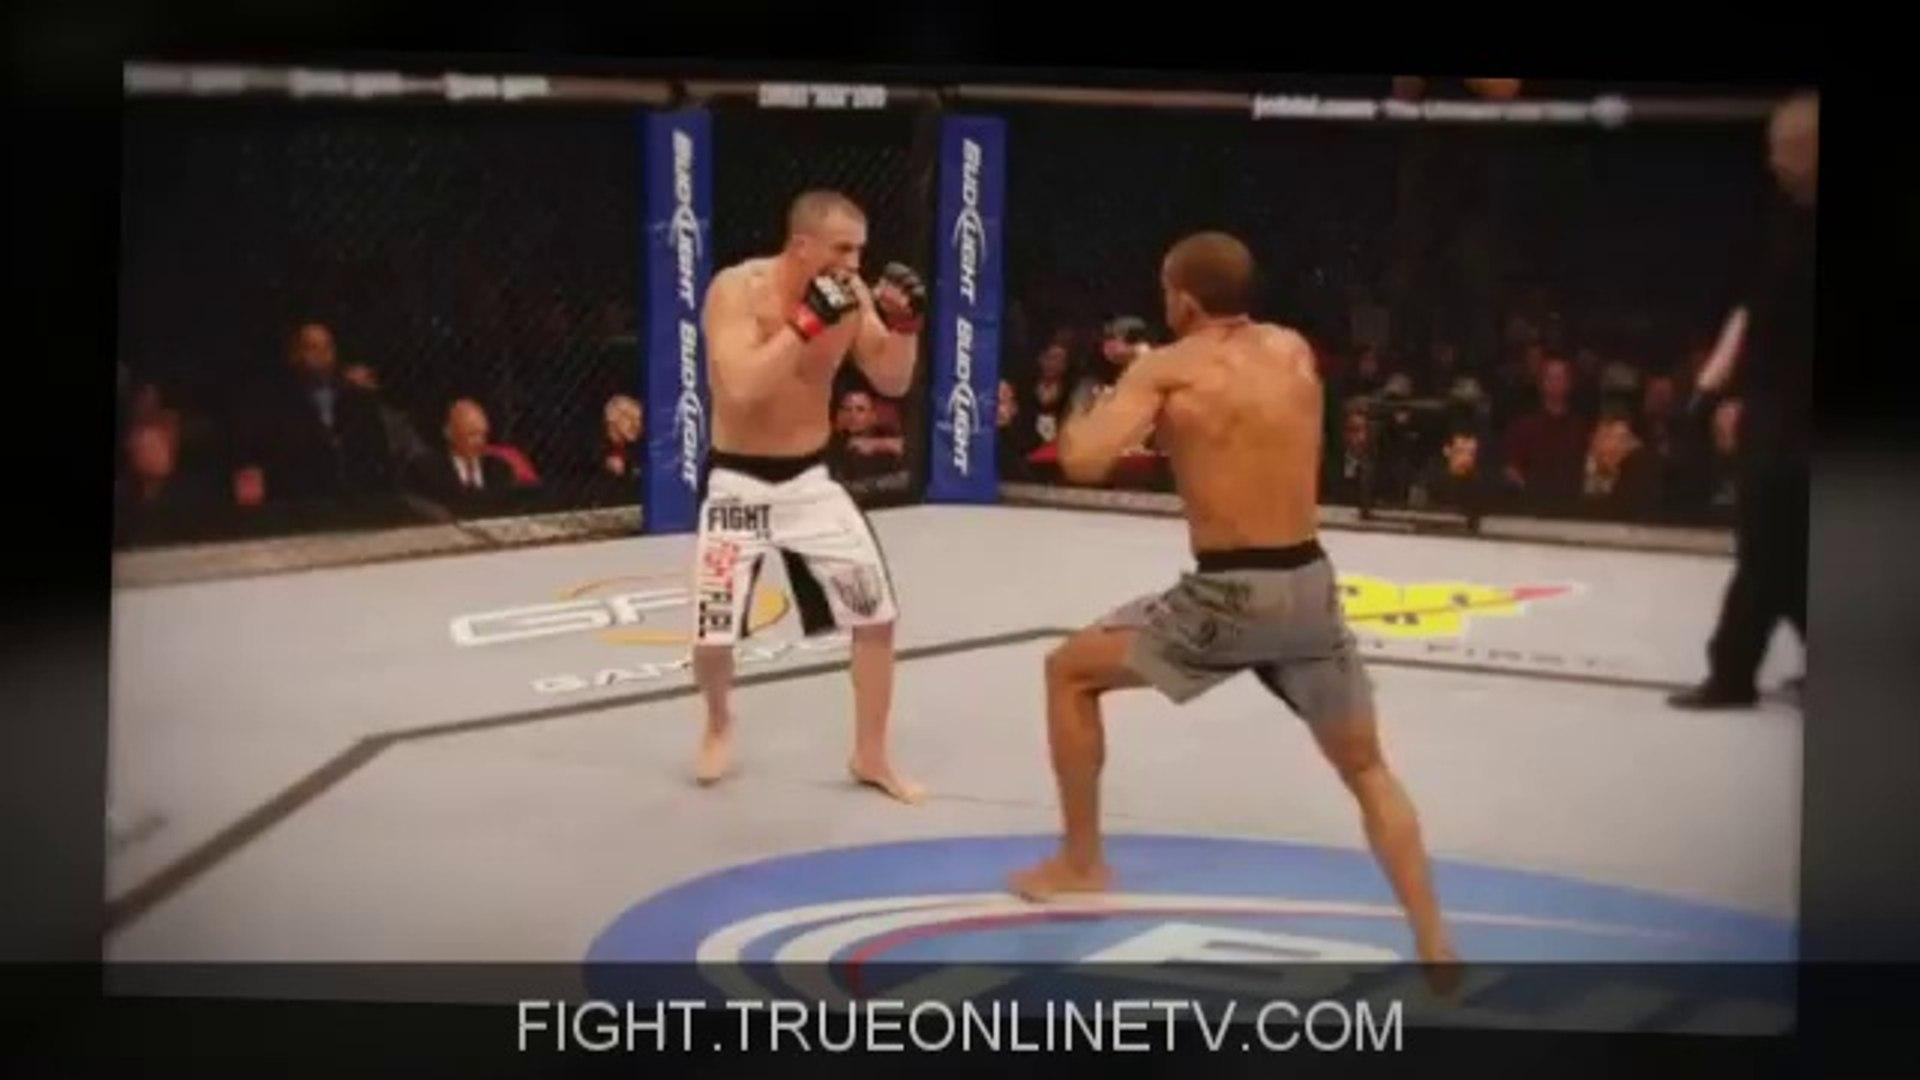 Watch Thomas Vasquez vs. Marcos Galvao - live stream BFC 118 - watch mma online - mma tv live stream